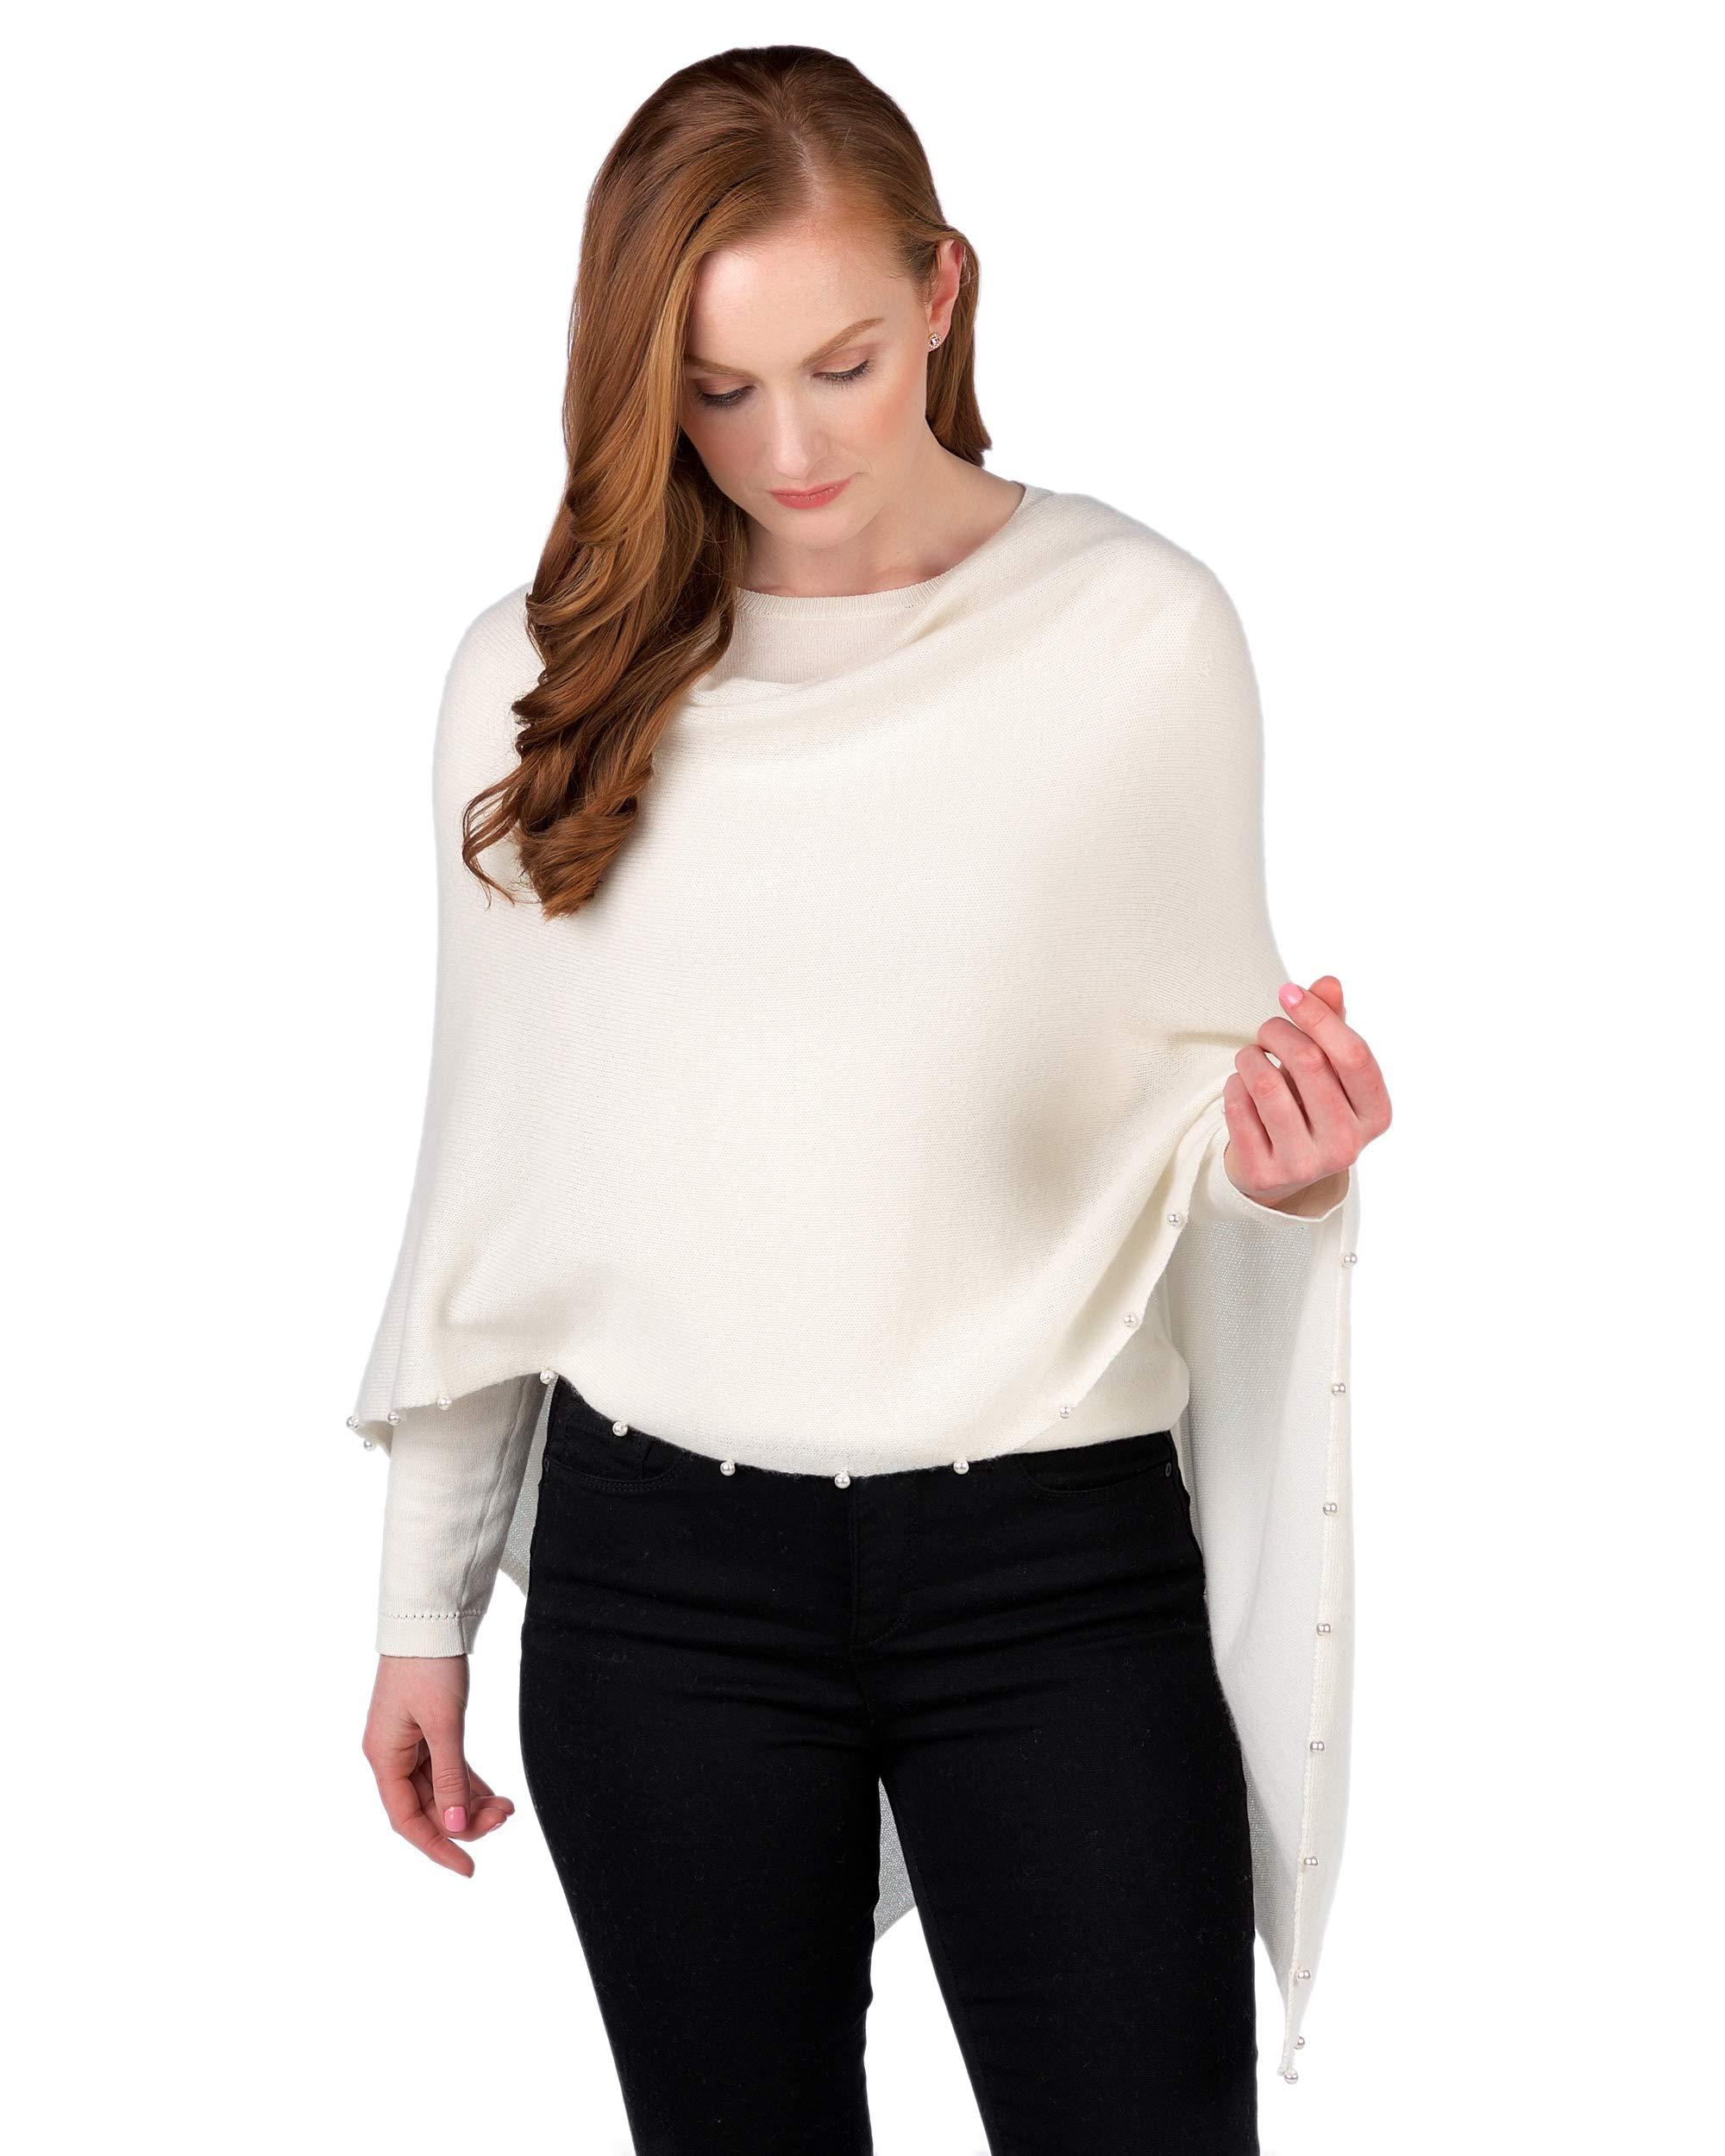 Claudia Nichole by Alashan 100% Cashmere Pearl Trim Dress Topper Poncho - White